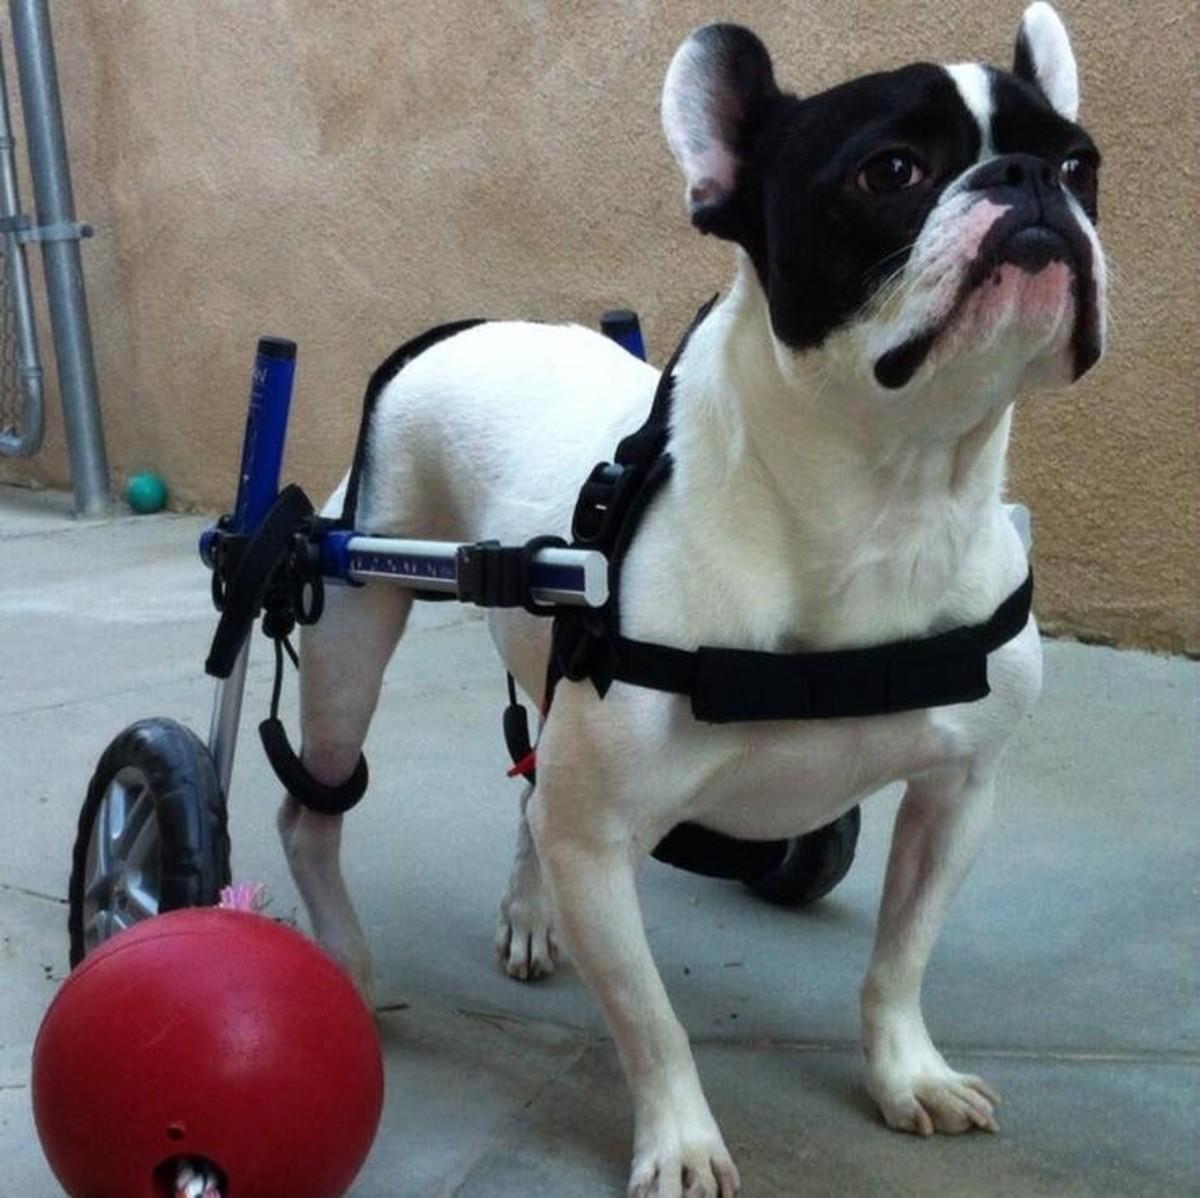 Walter the French Bulldog